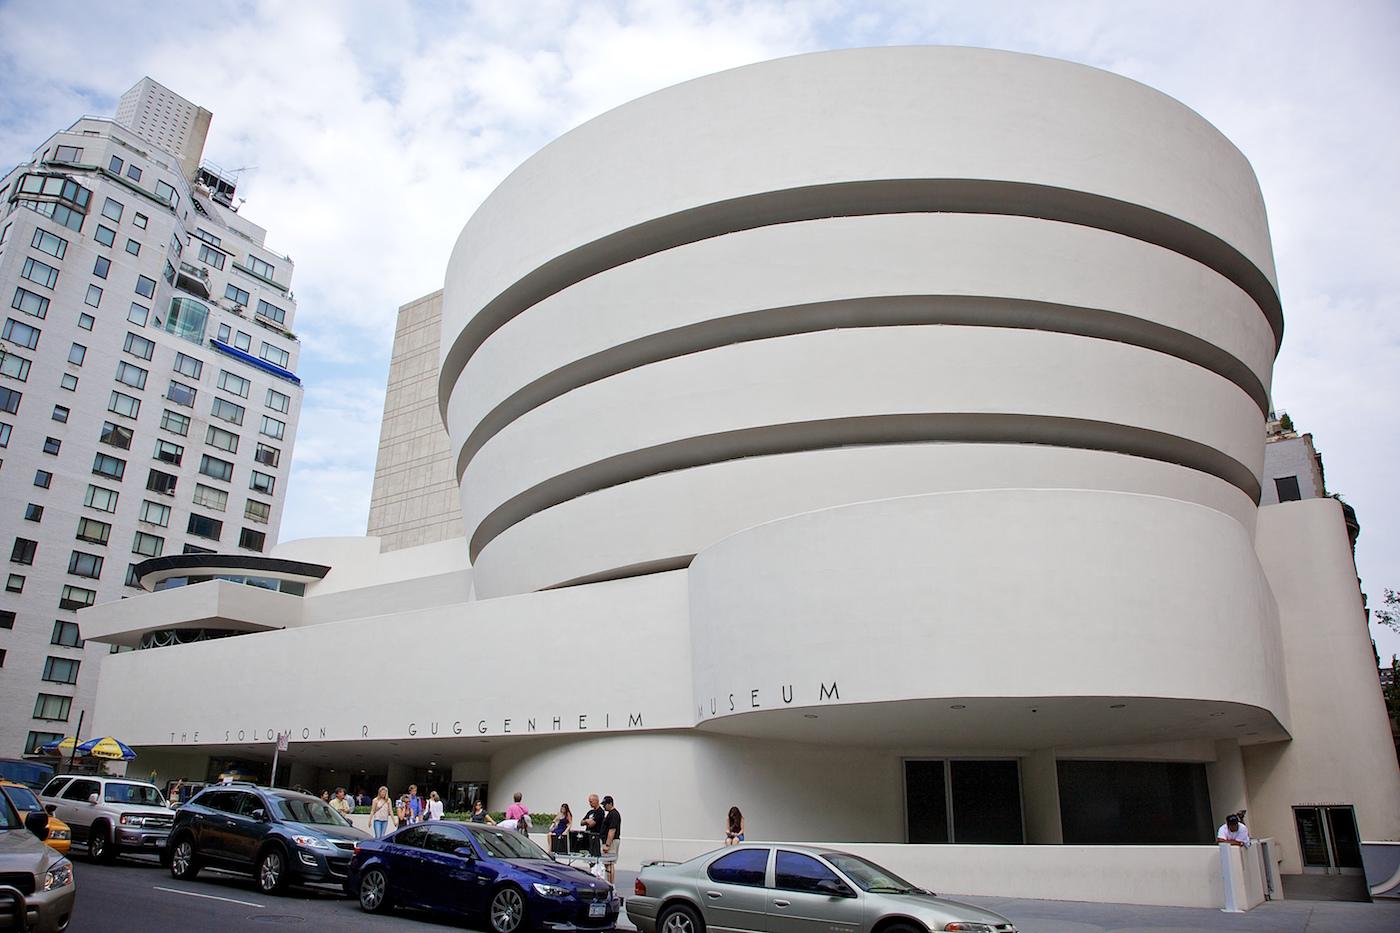 Guggenheim Museum In New York Designer